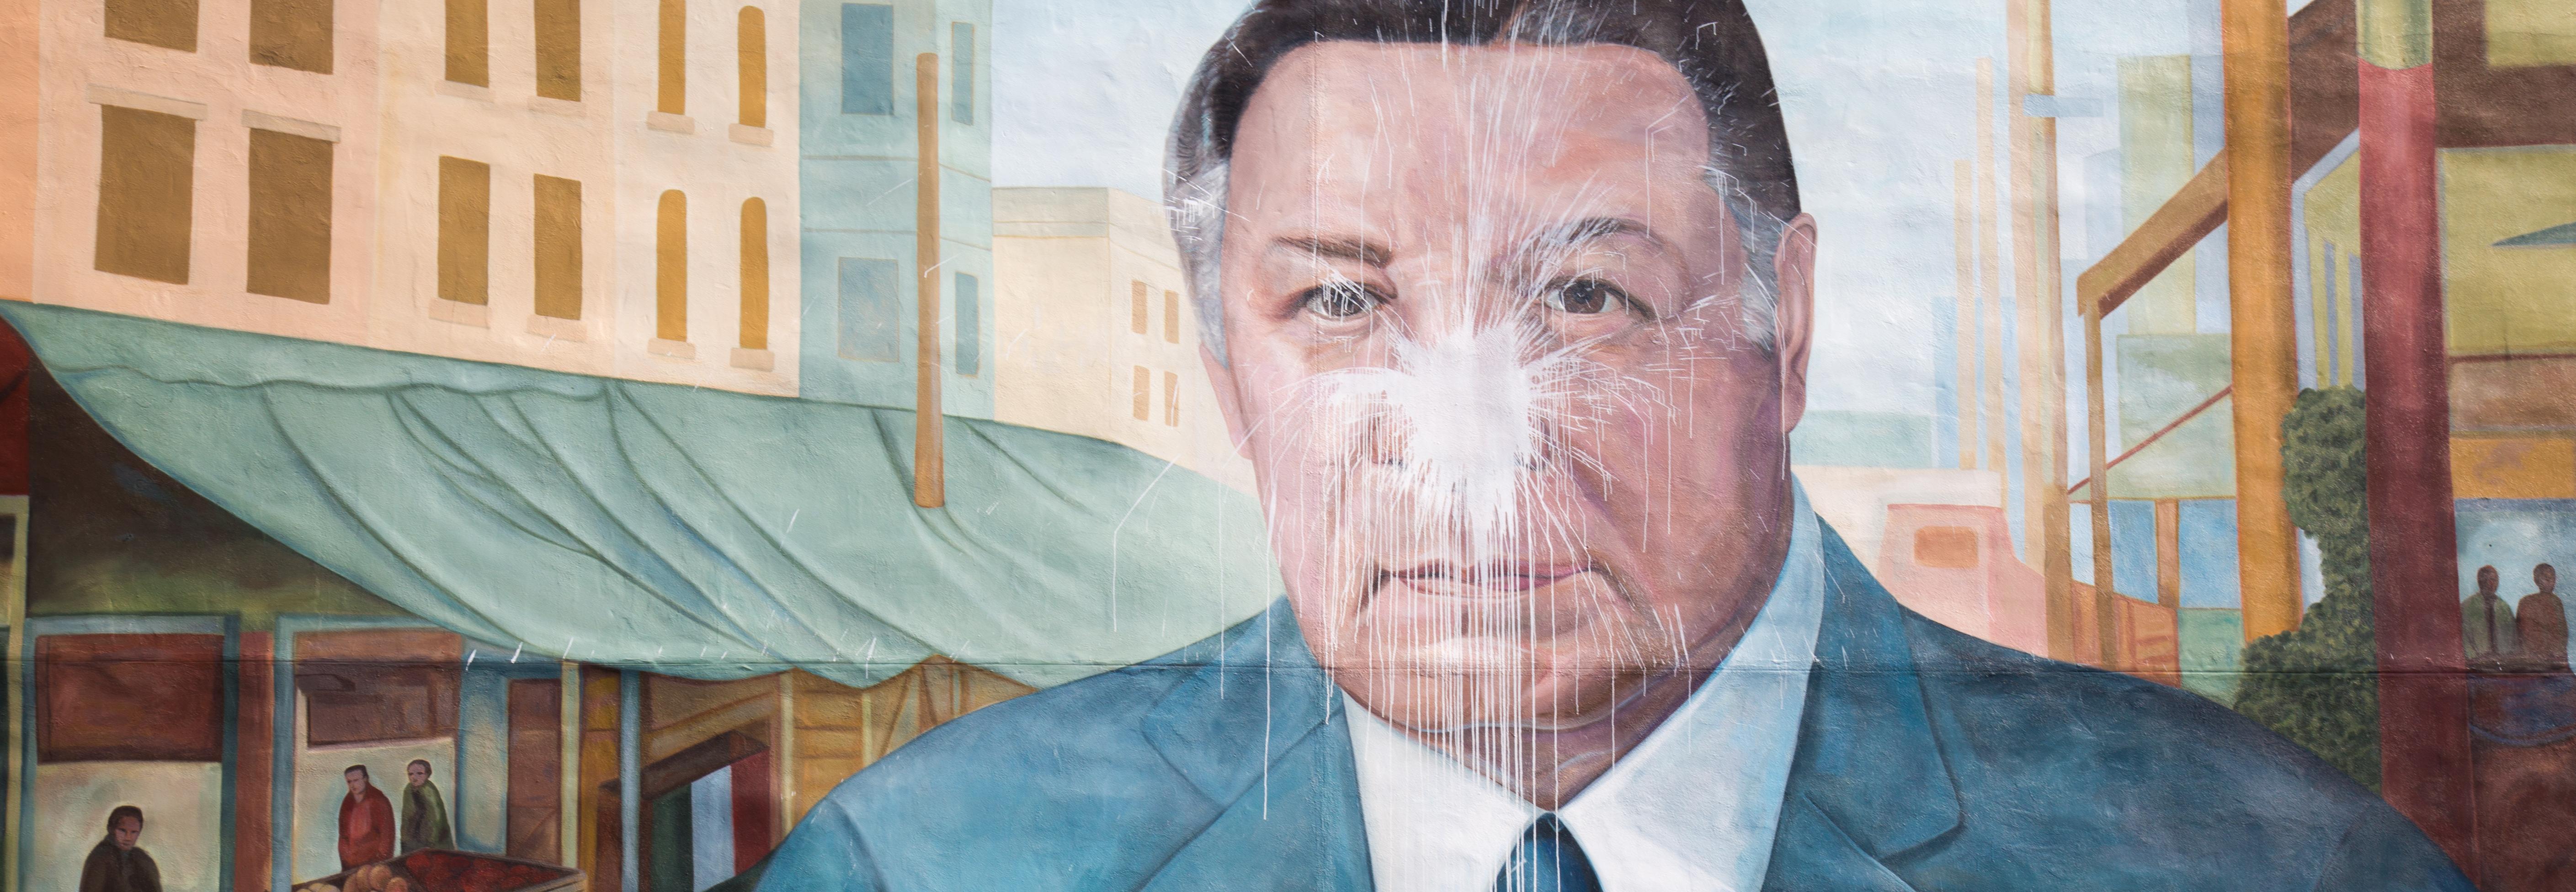 Frank Rizzo mural. Samantha Laub/ALDÍANews